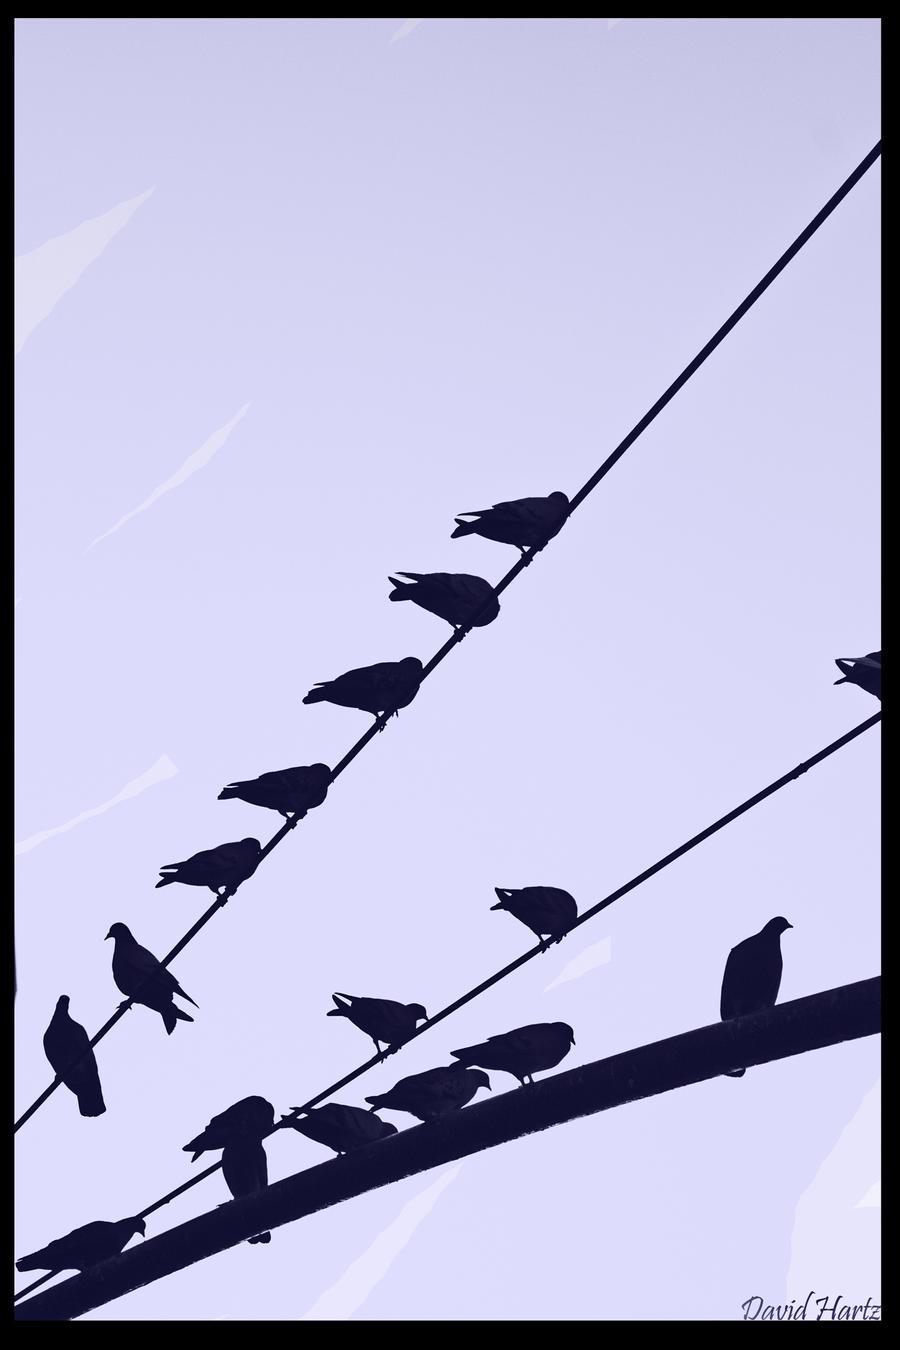 Bird silhouette by davidheartzs